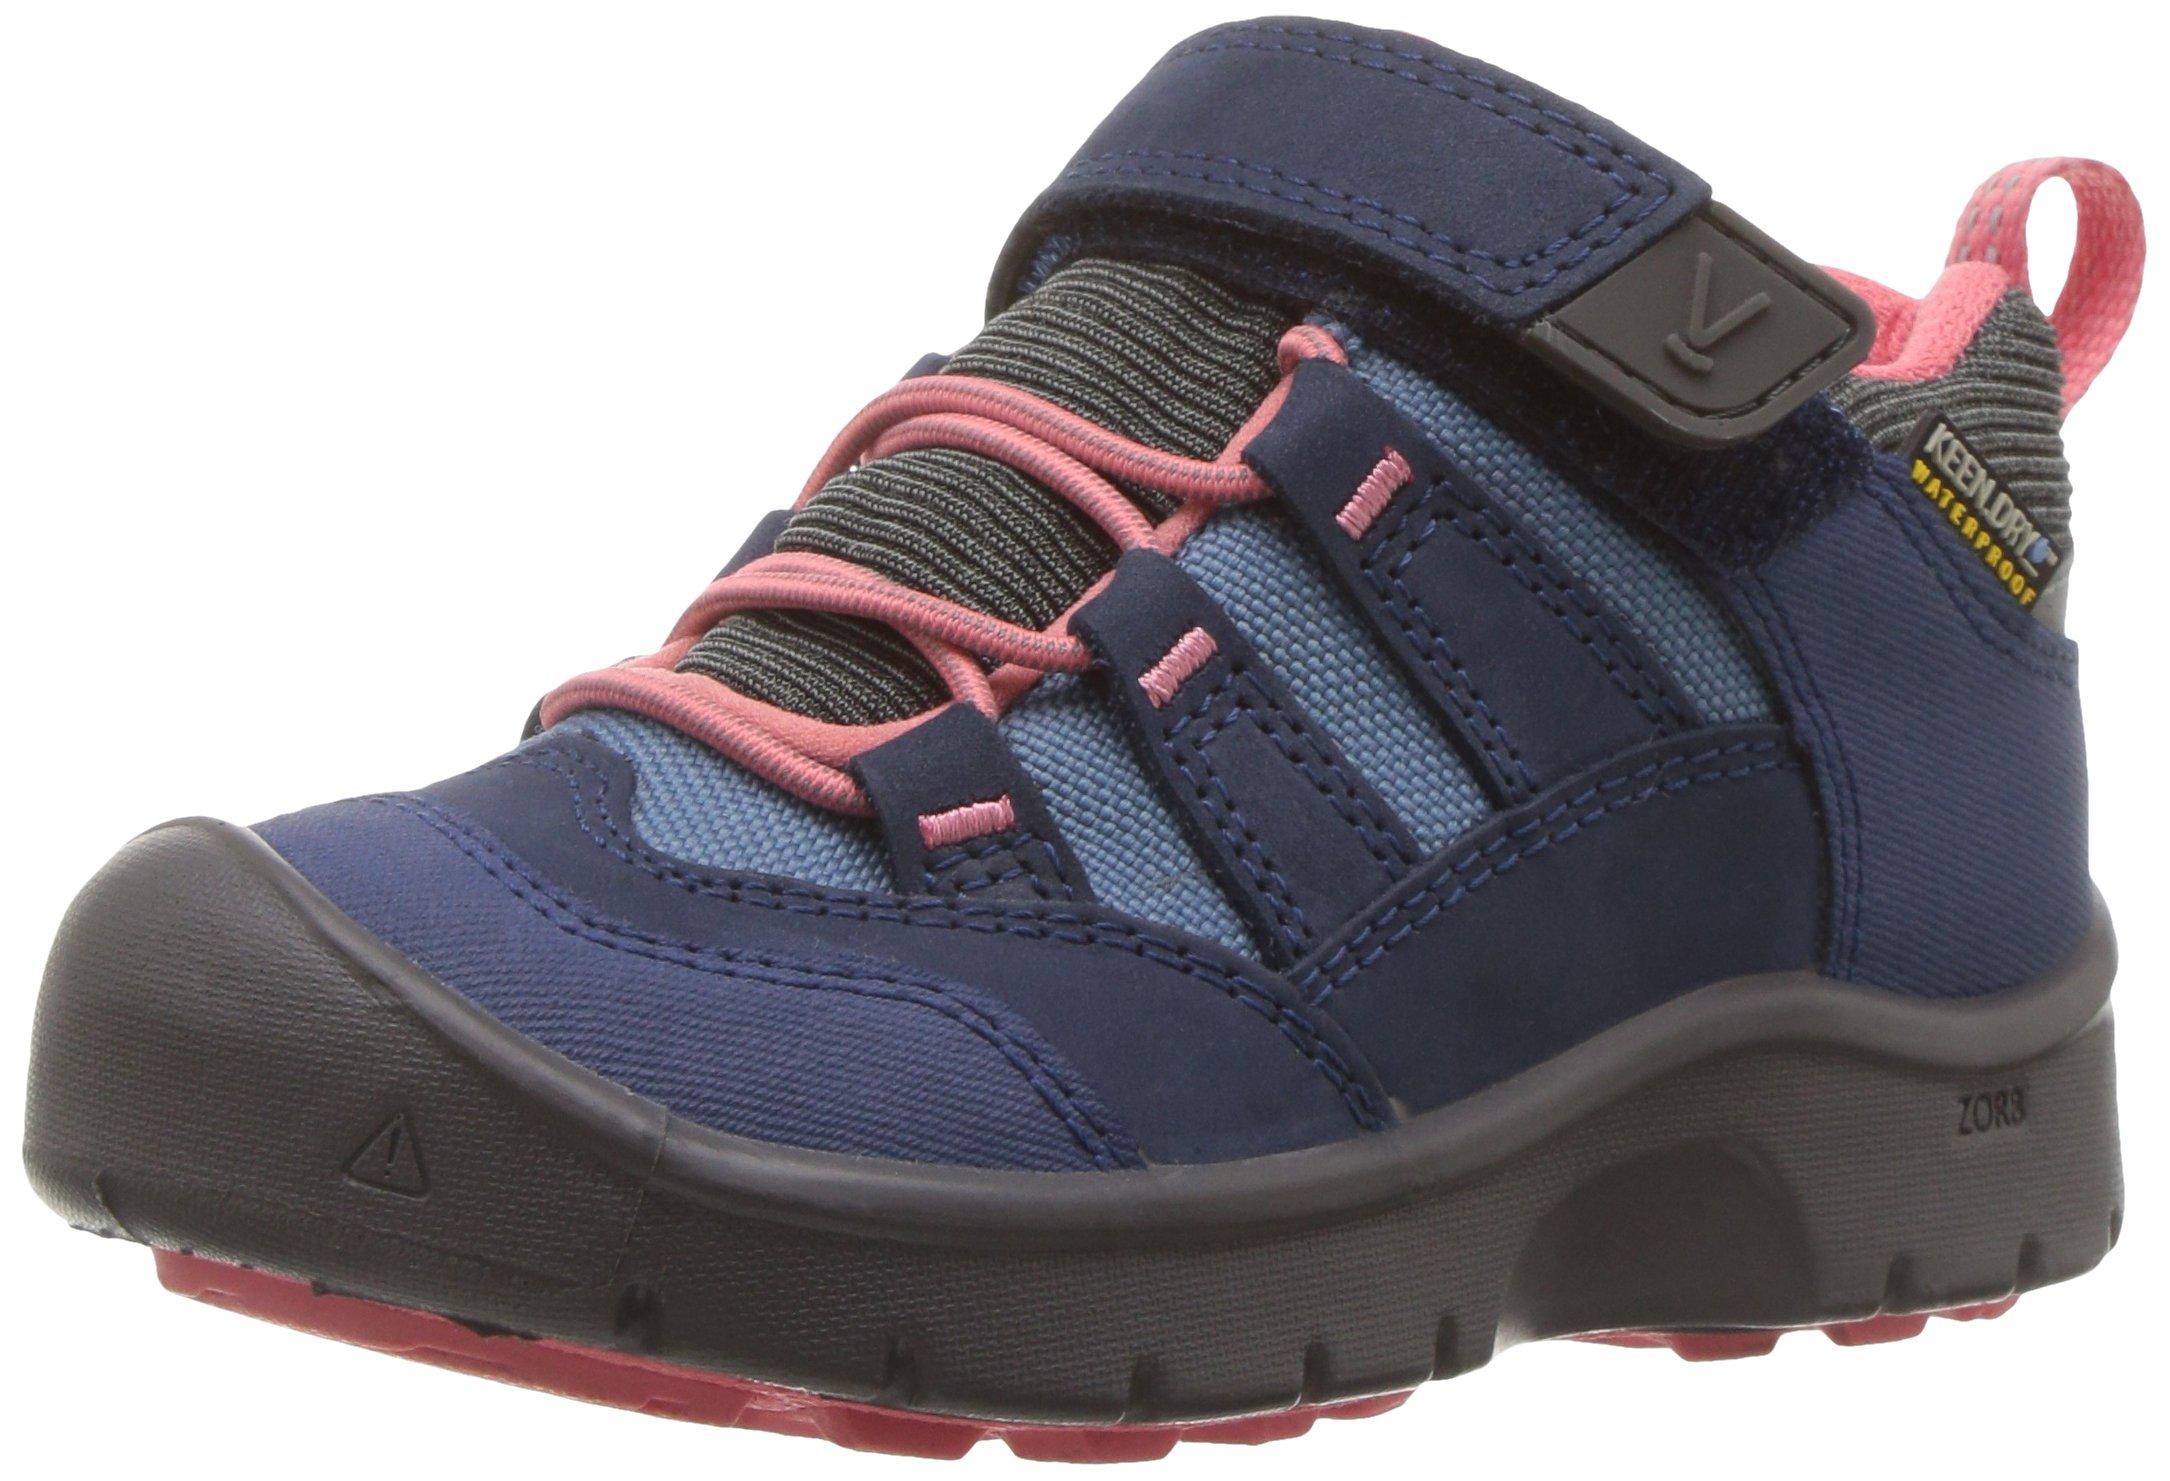 KEEN Kids' Hikeport WP Hiking Shoe,Dress Blues/Sugar Coral,9 Toddler US Toddler